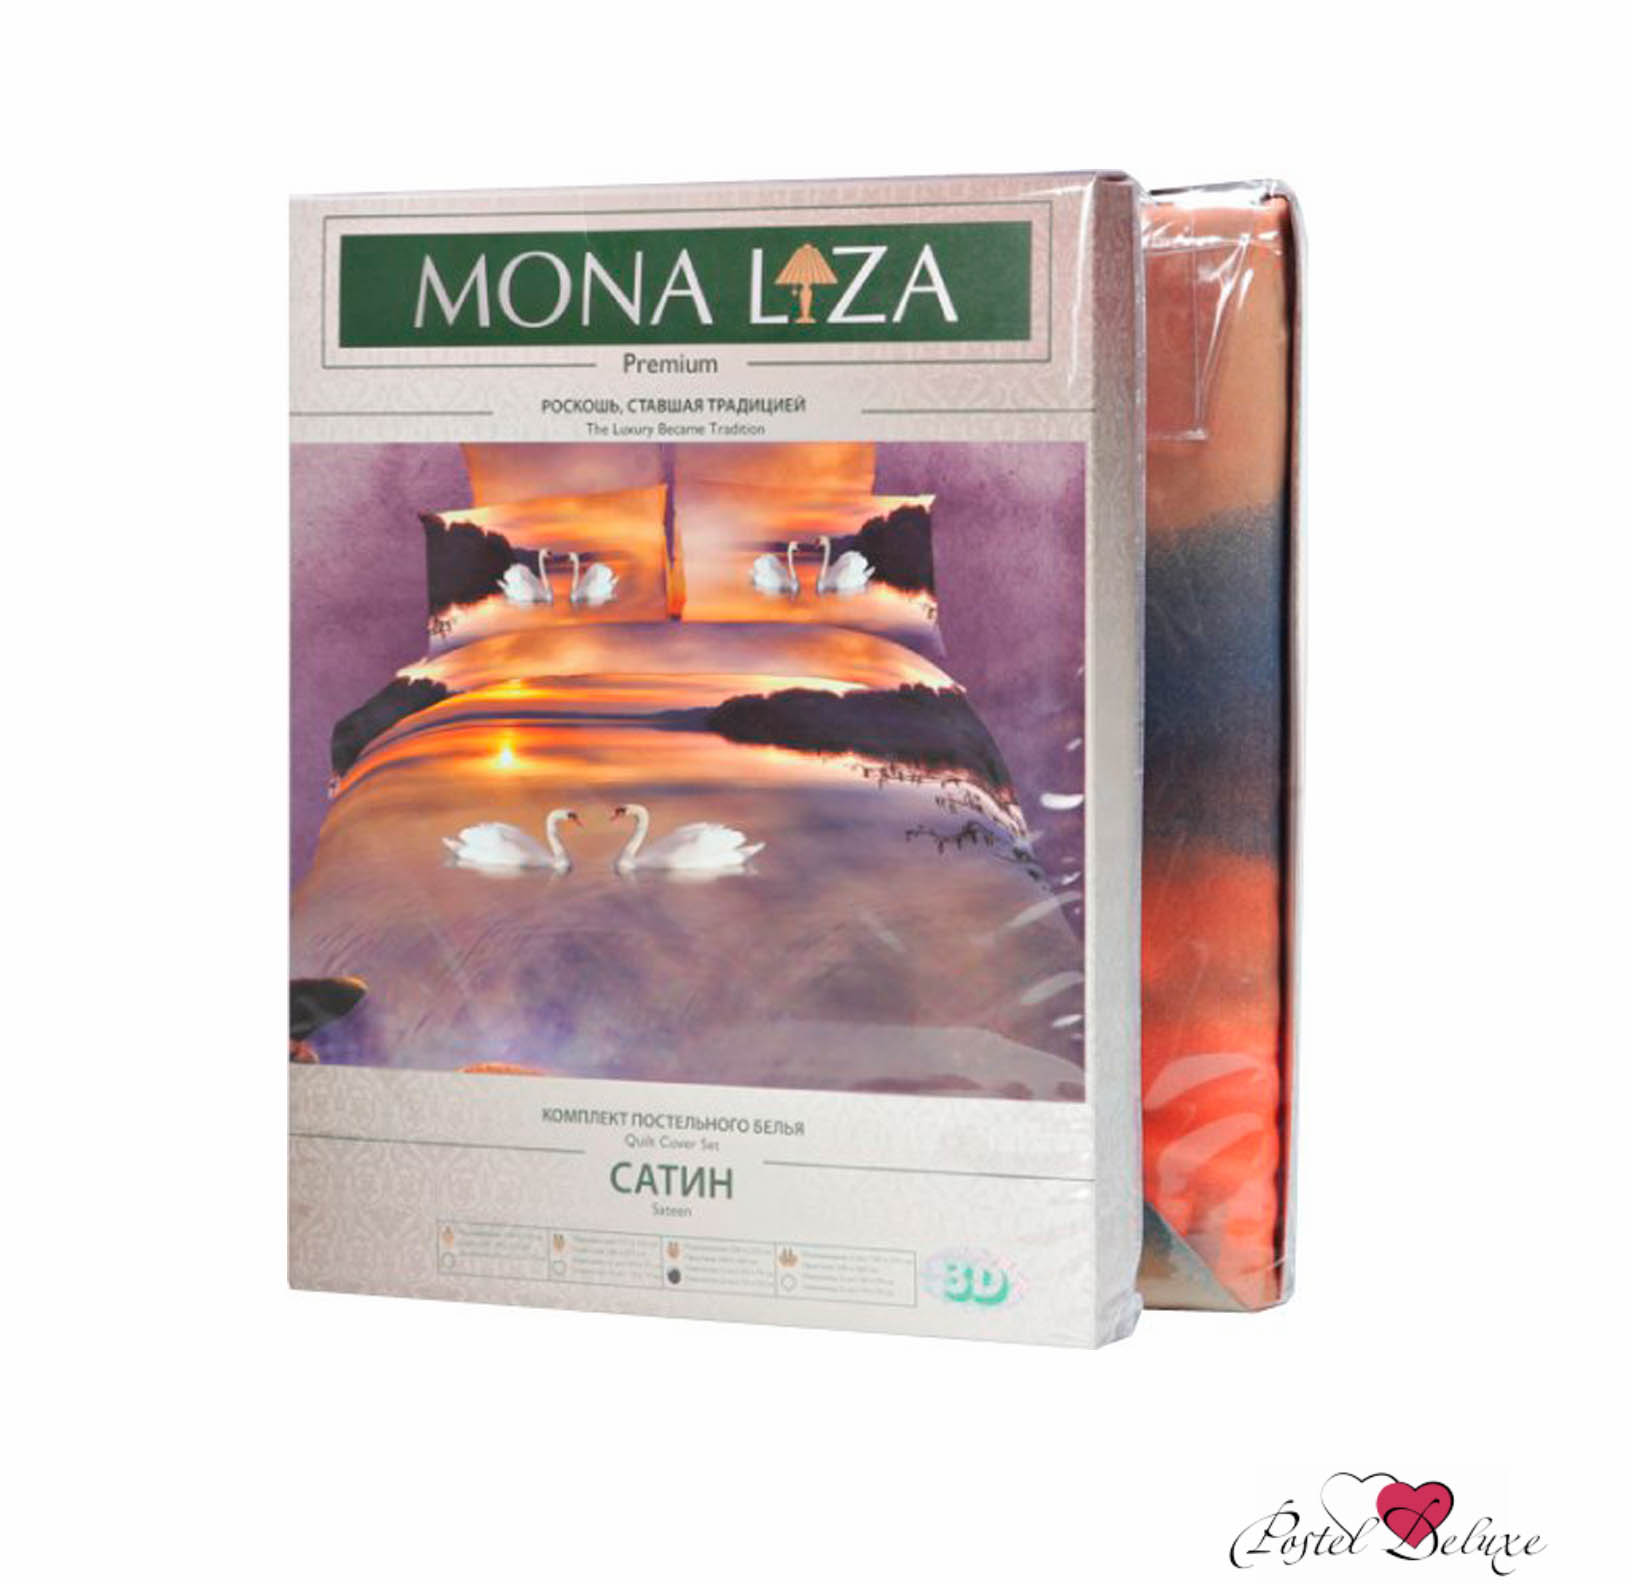 Постельное белье Mona Liza Постельное белье Wild (2 сп. евро) комплект пб 2 сп mona liza сатин жаккард royal 4 нав 2шт 70х70 и 2 шт